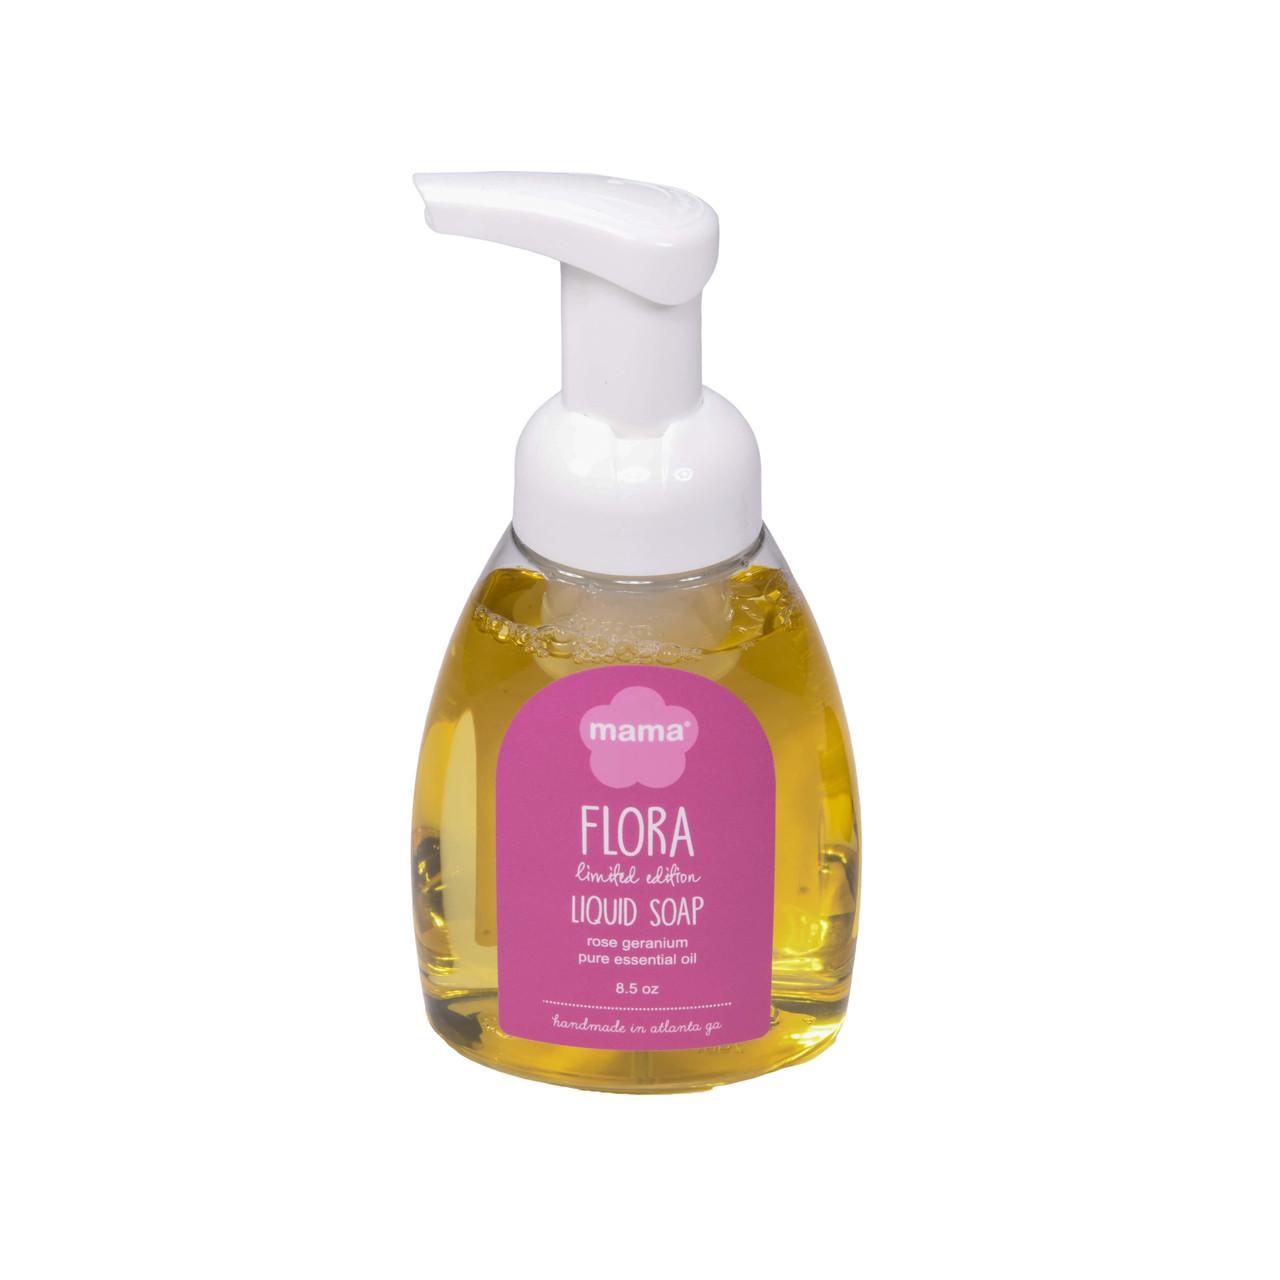 Flora (Rose Geranium) Liquid Soap | Mama Bath + Body